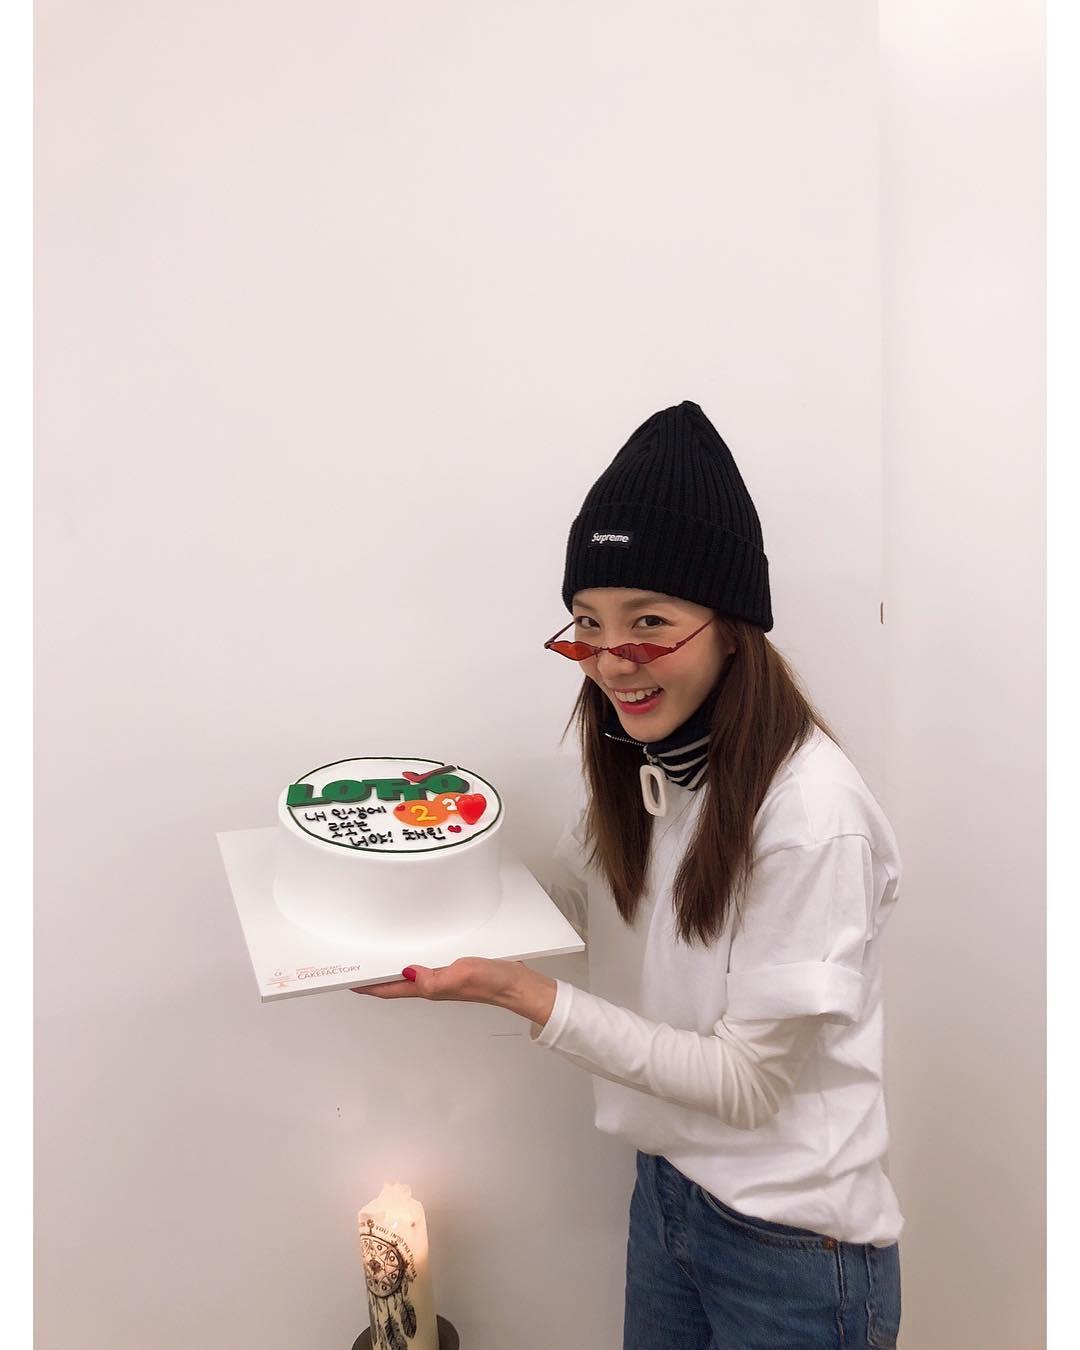 2NE1团魂不灭!朴春时隔8年再推个人专辑! Dara力挺友情出演新歌MV&成员近况大盘点!插图5